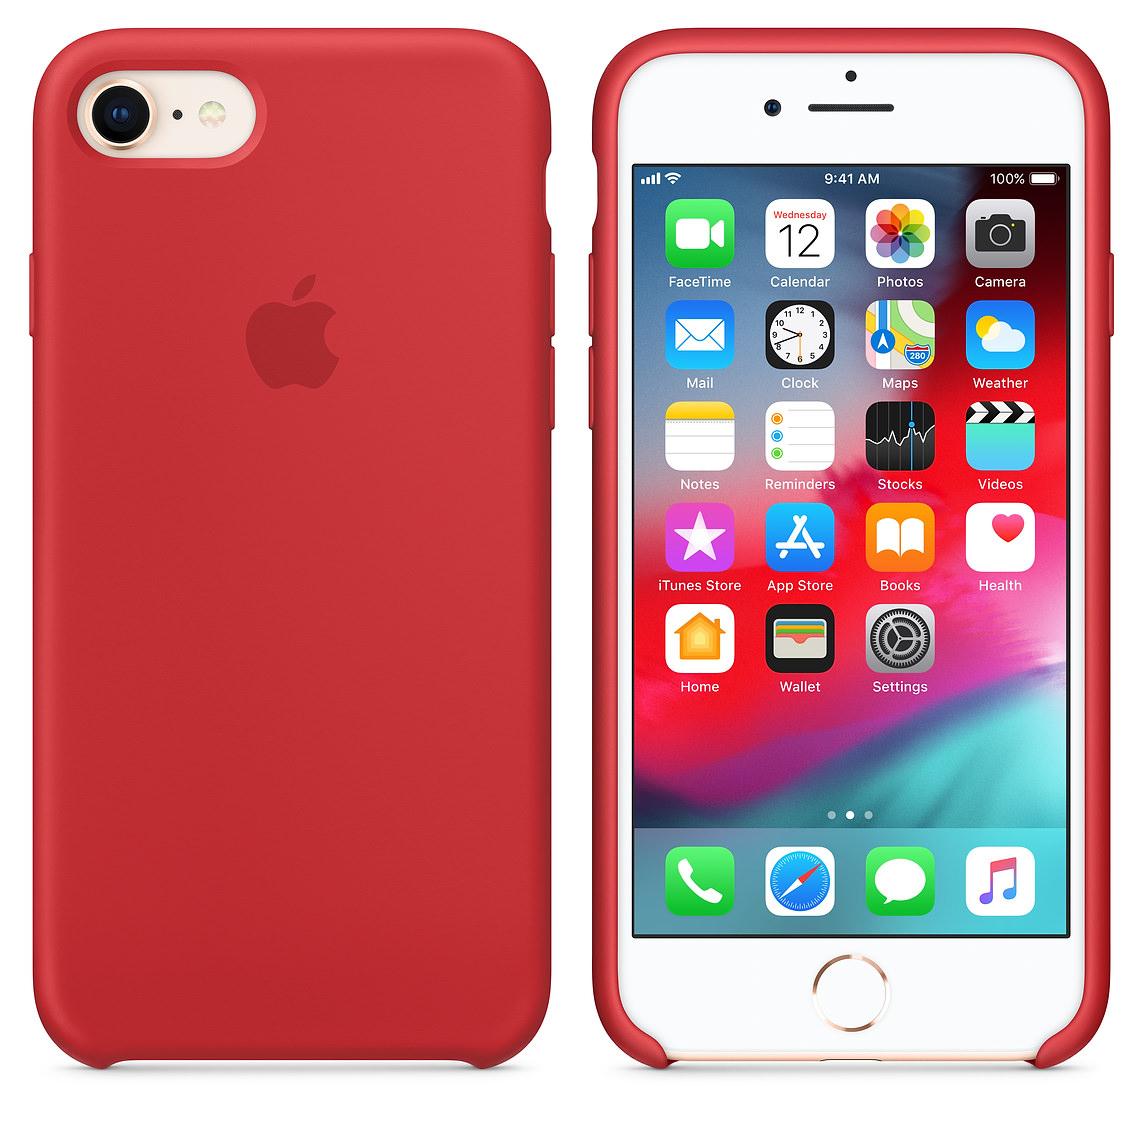 Apple silikónový obal pre iPhone SE 2020 - červený 3